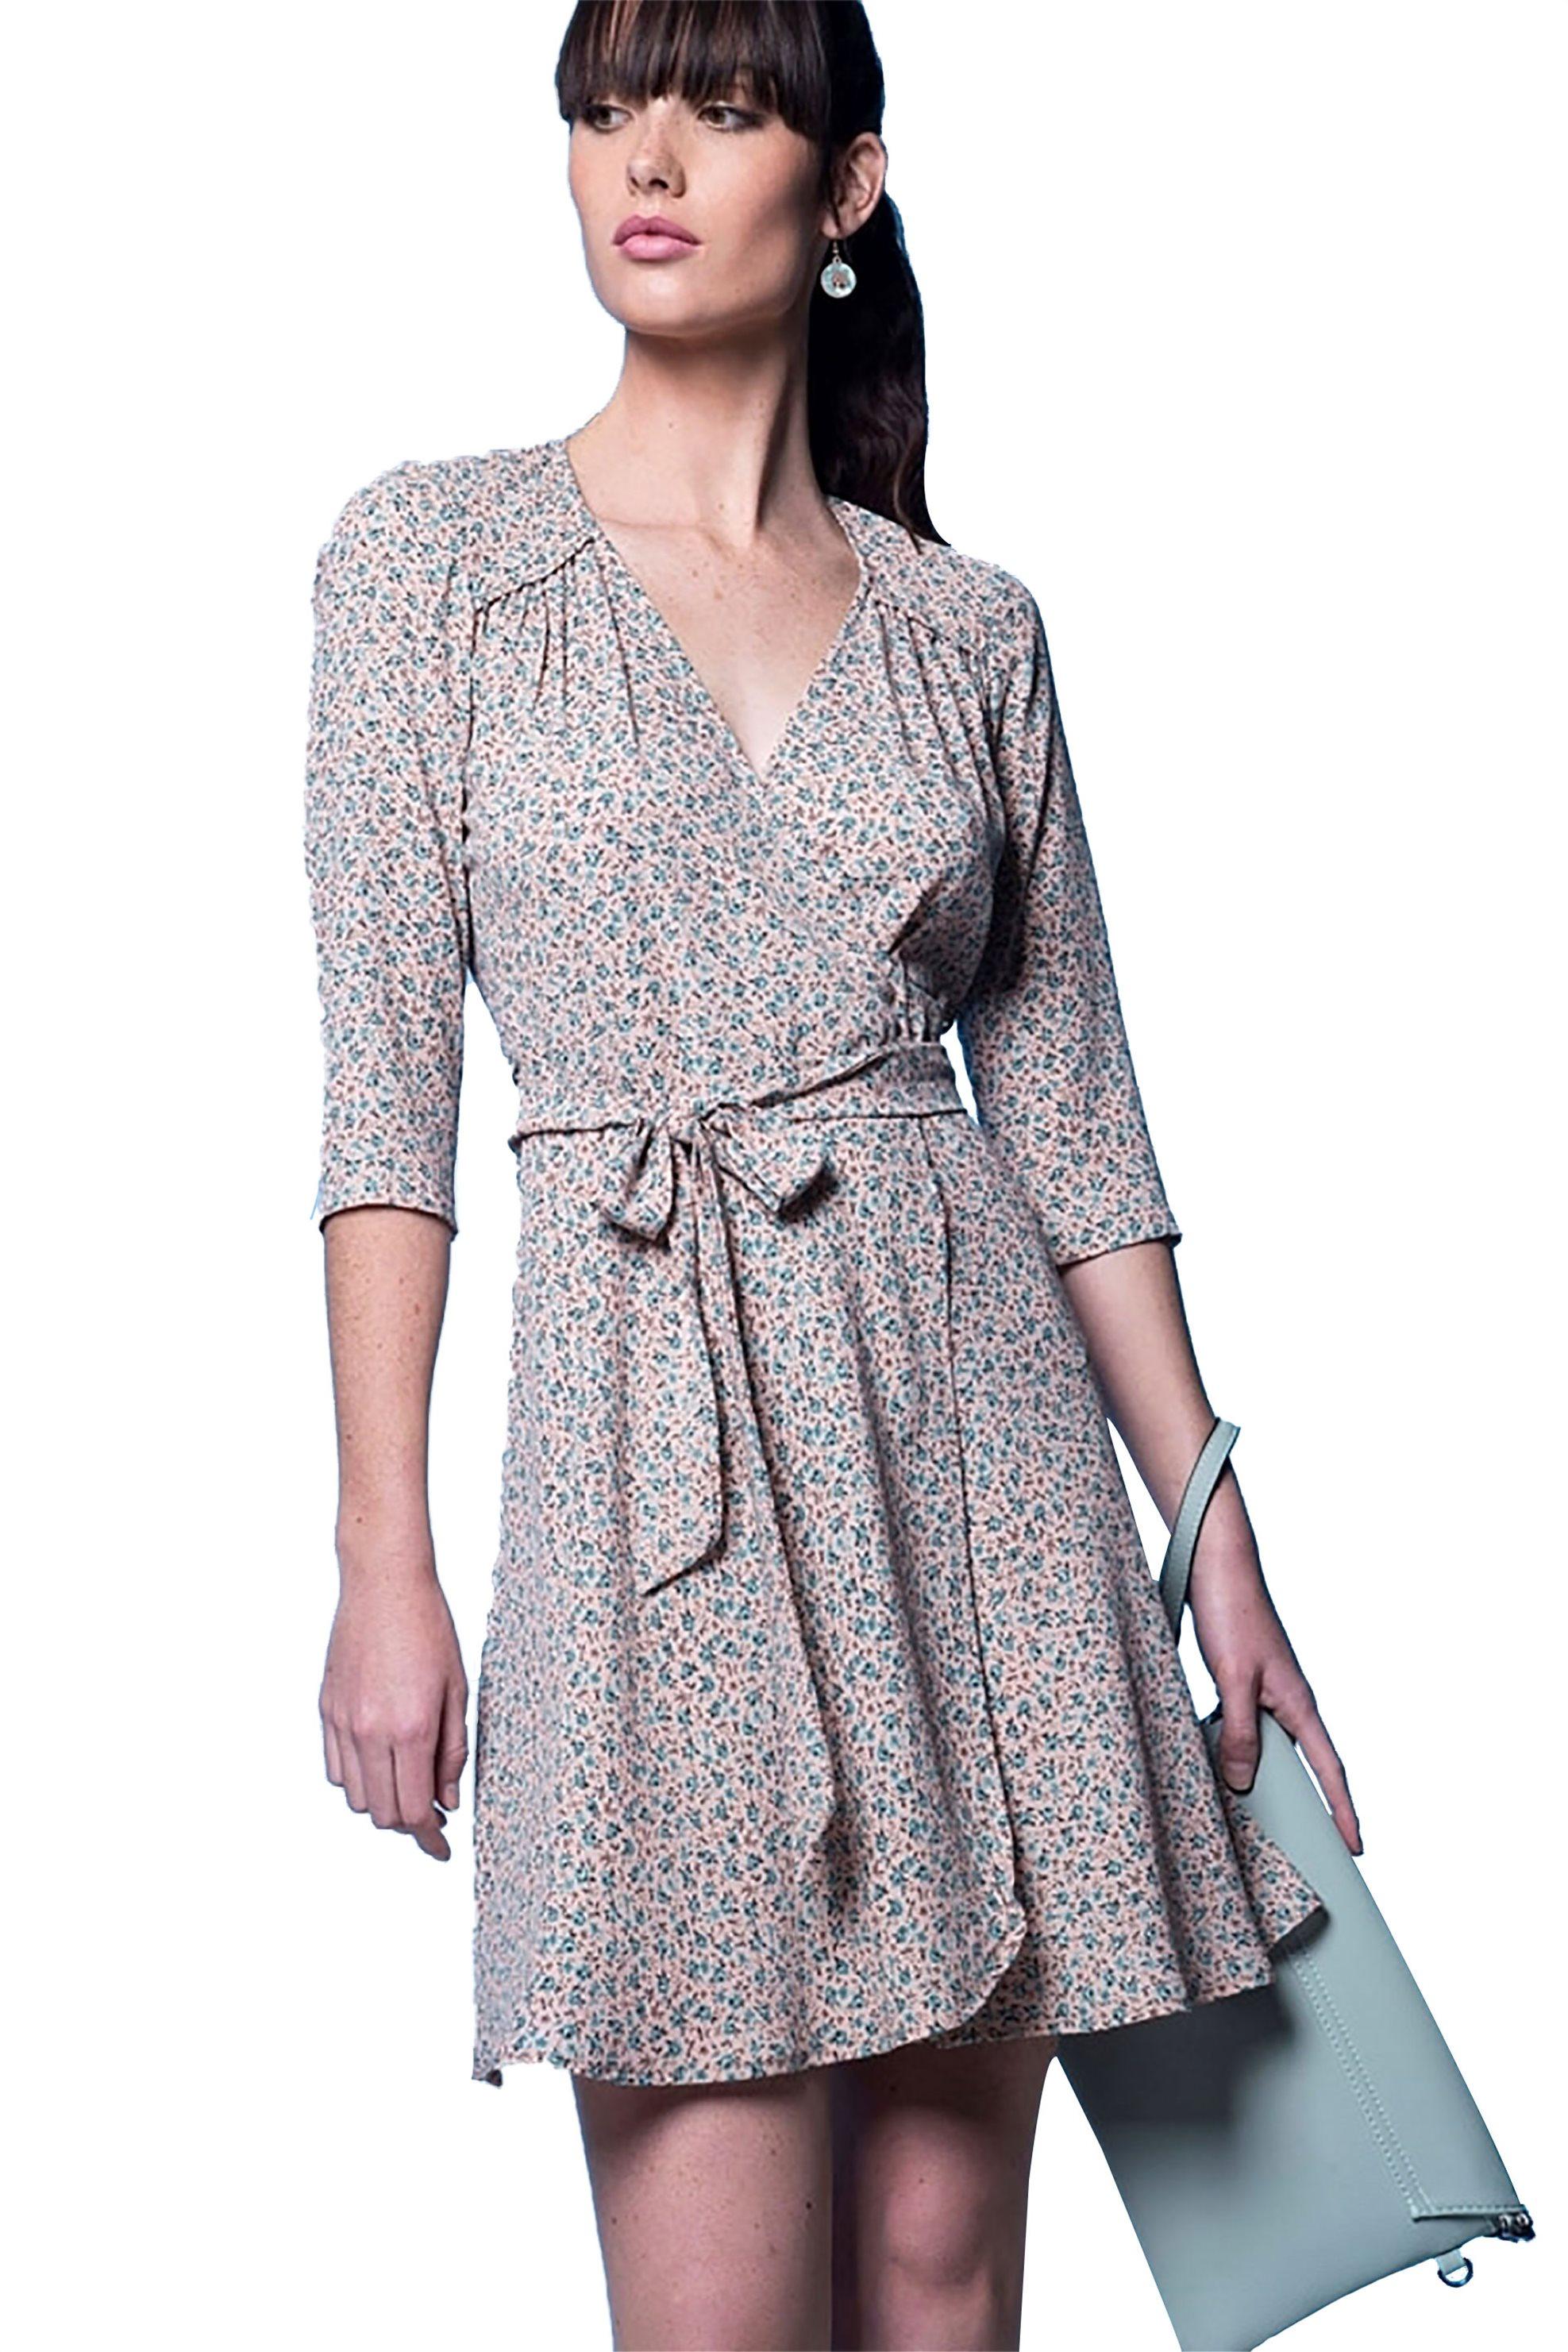 2179080ac951 Γυναικεία   Ρούχα   Φορέματα   Καθημερινά   8542 AX Εντυπωσιακό ...